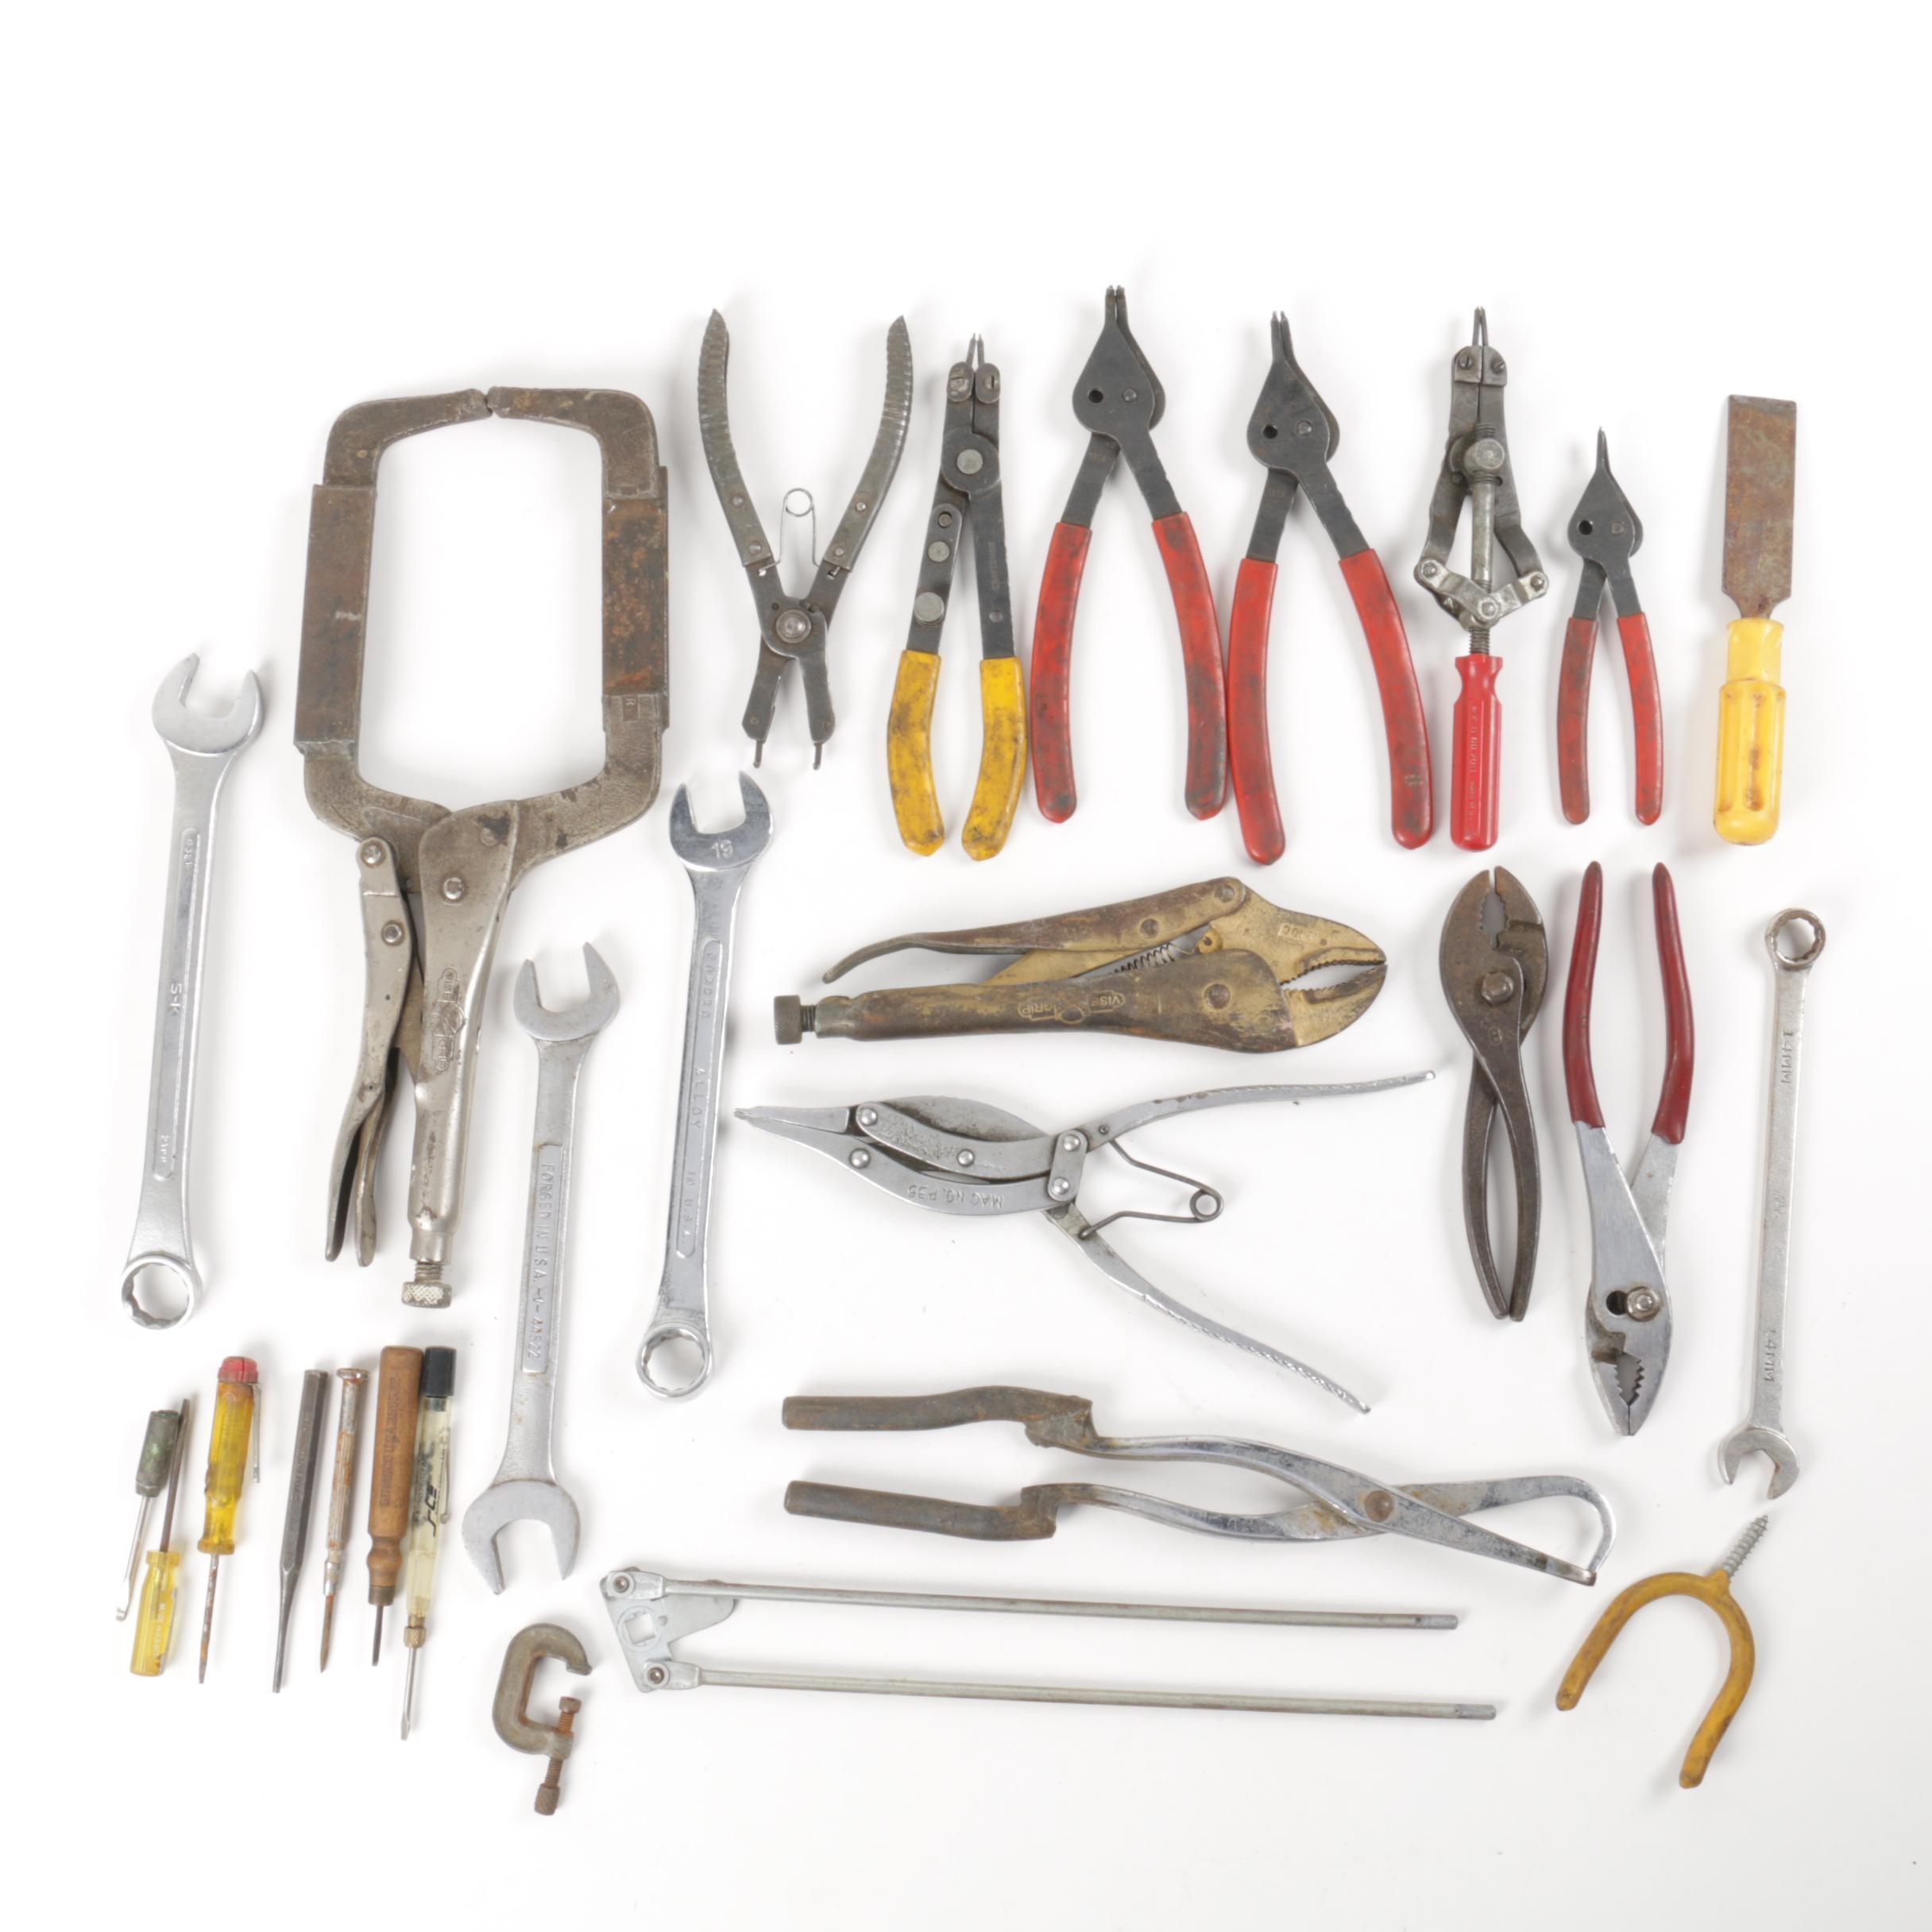 Assortment of Vintage Tools